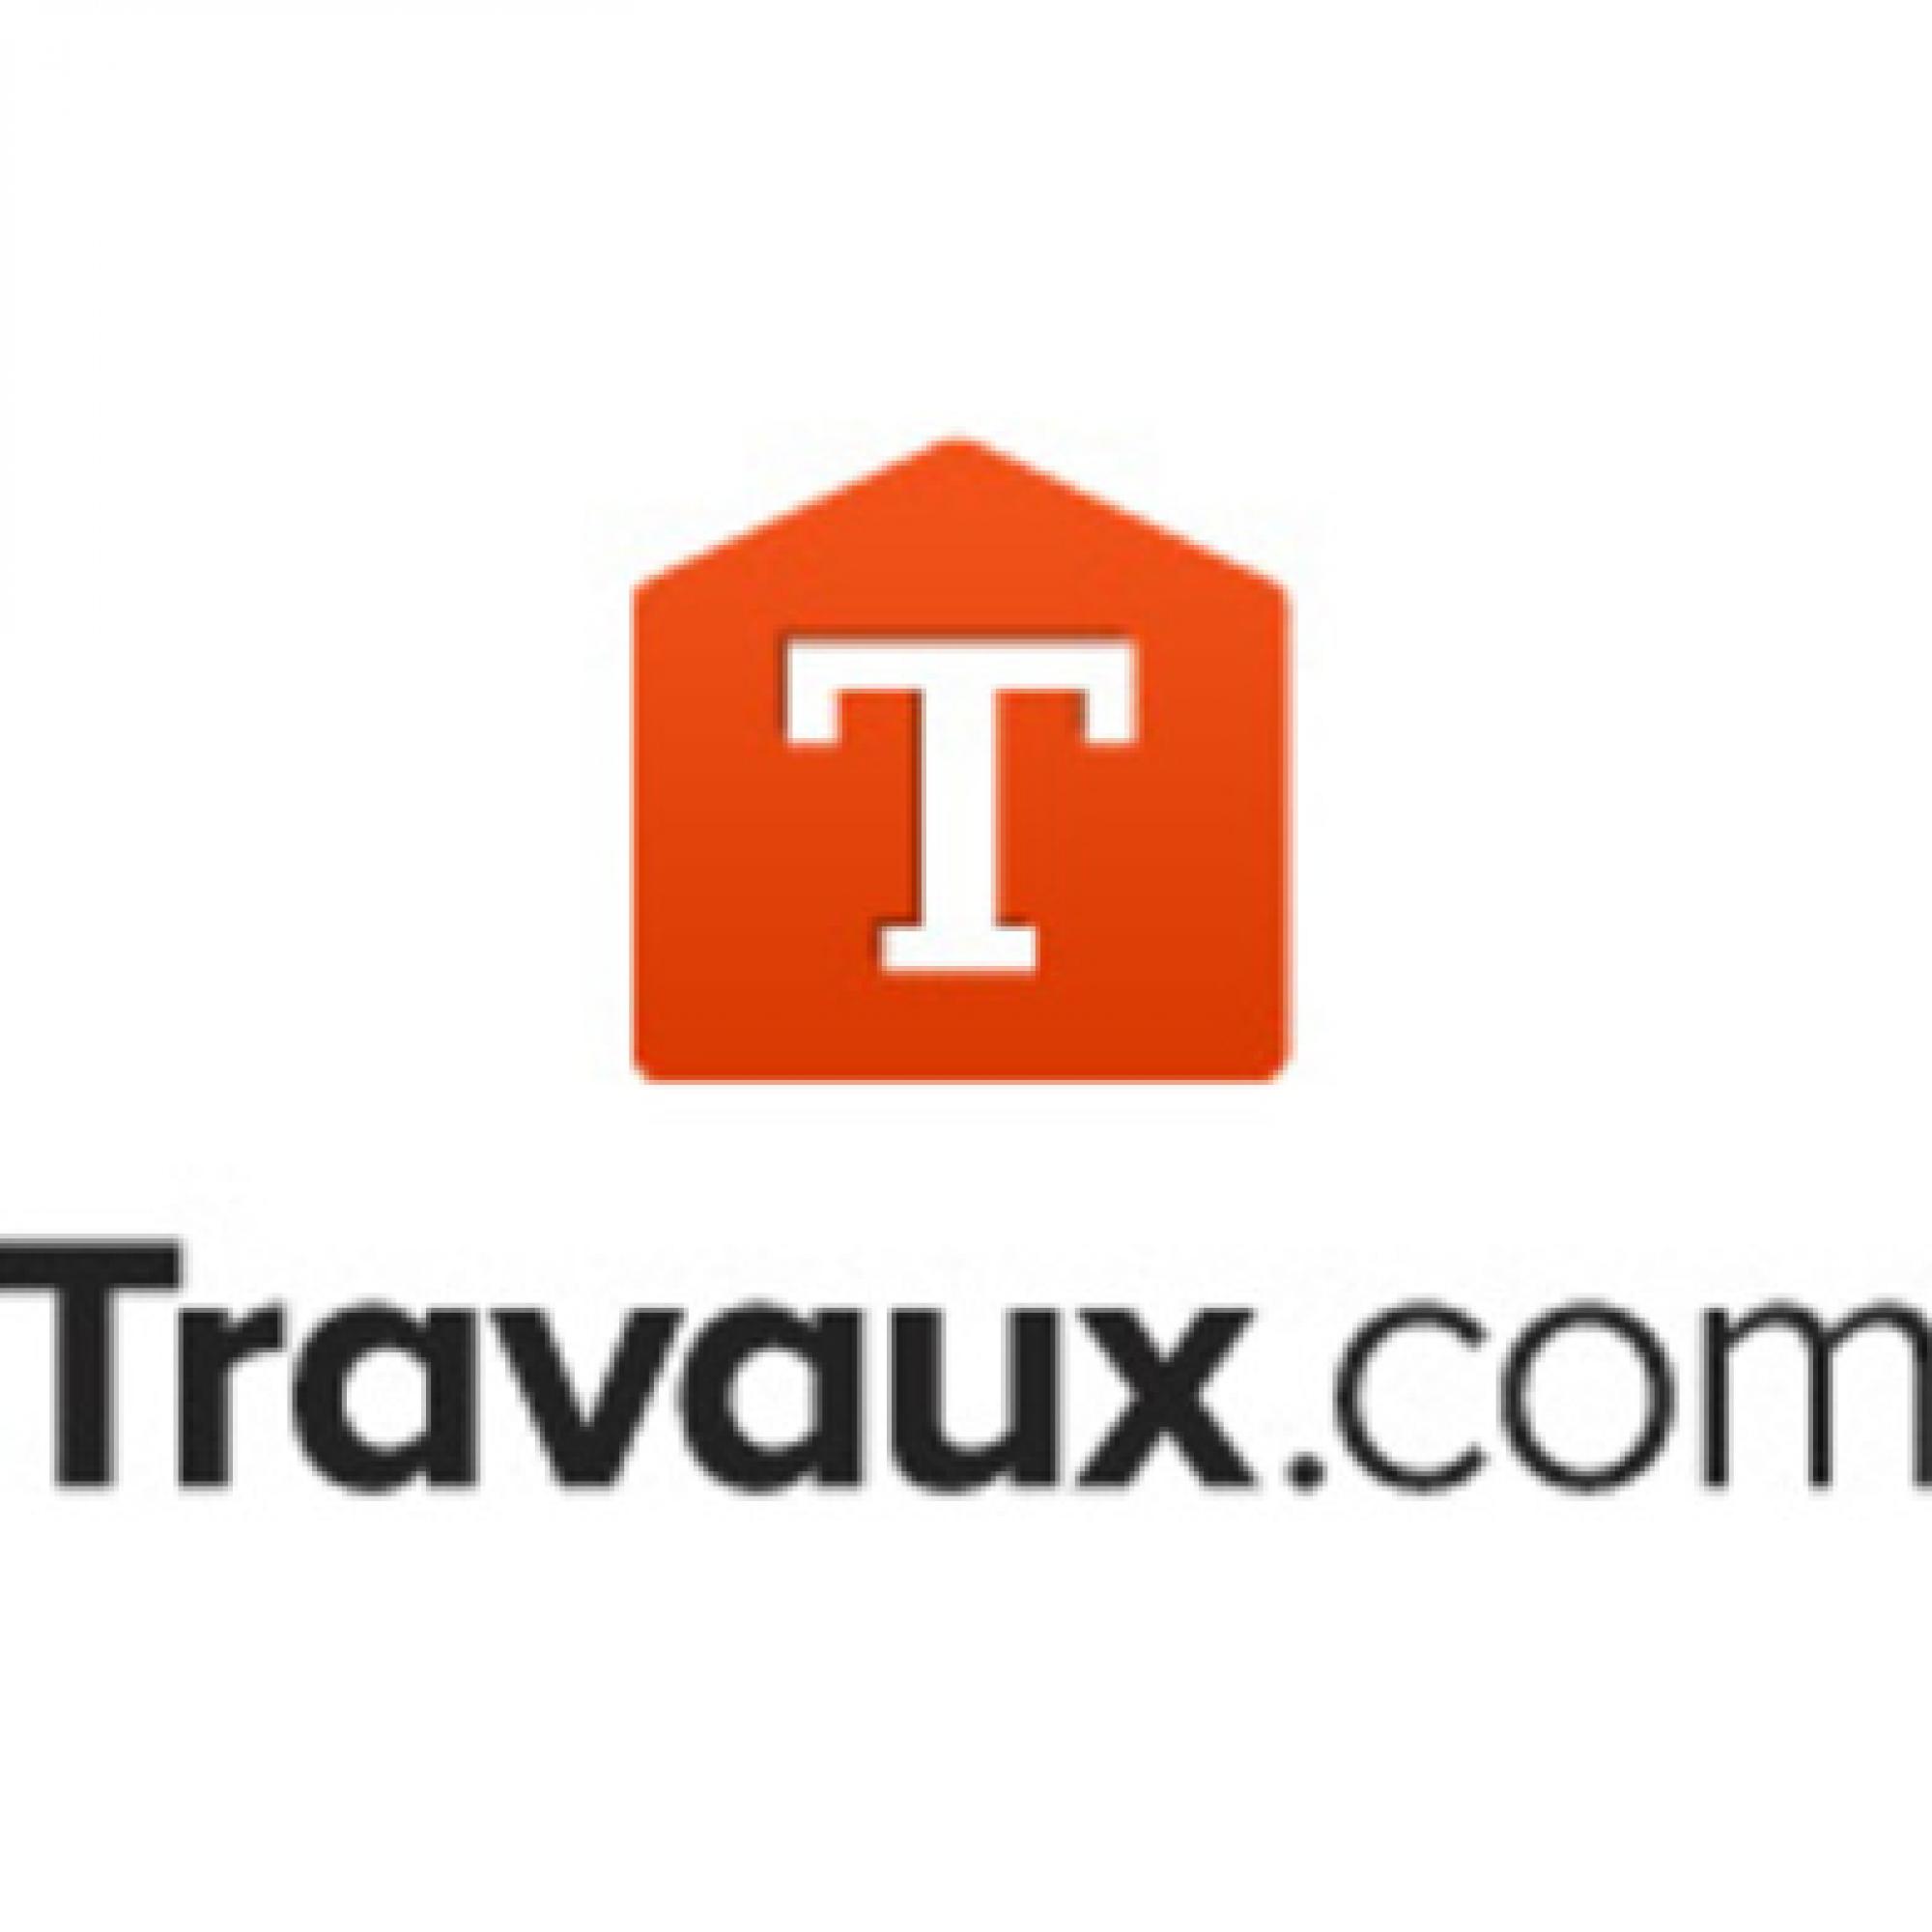 Travaux.com